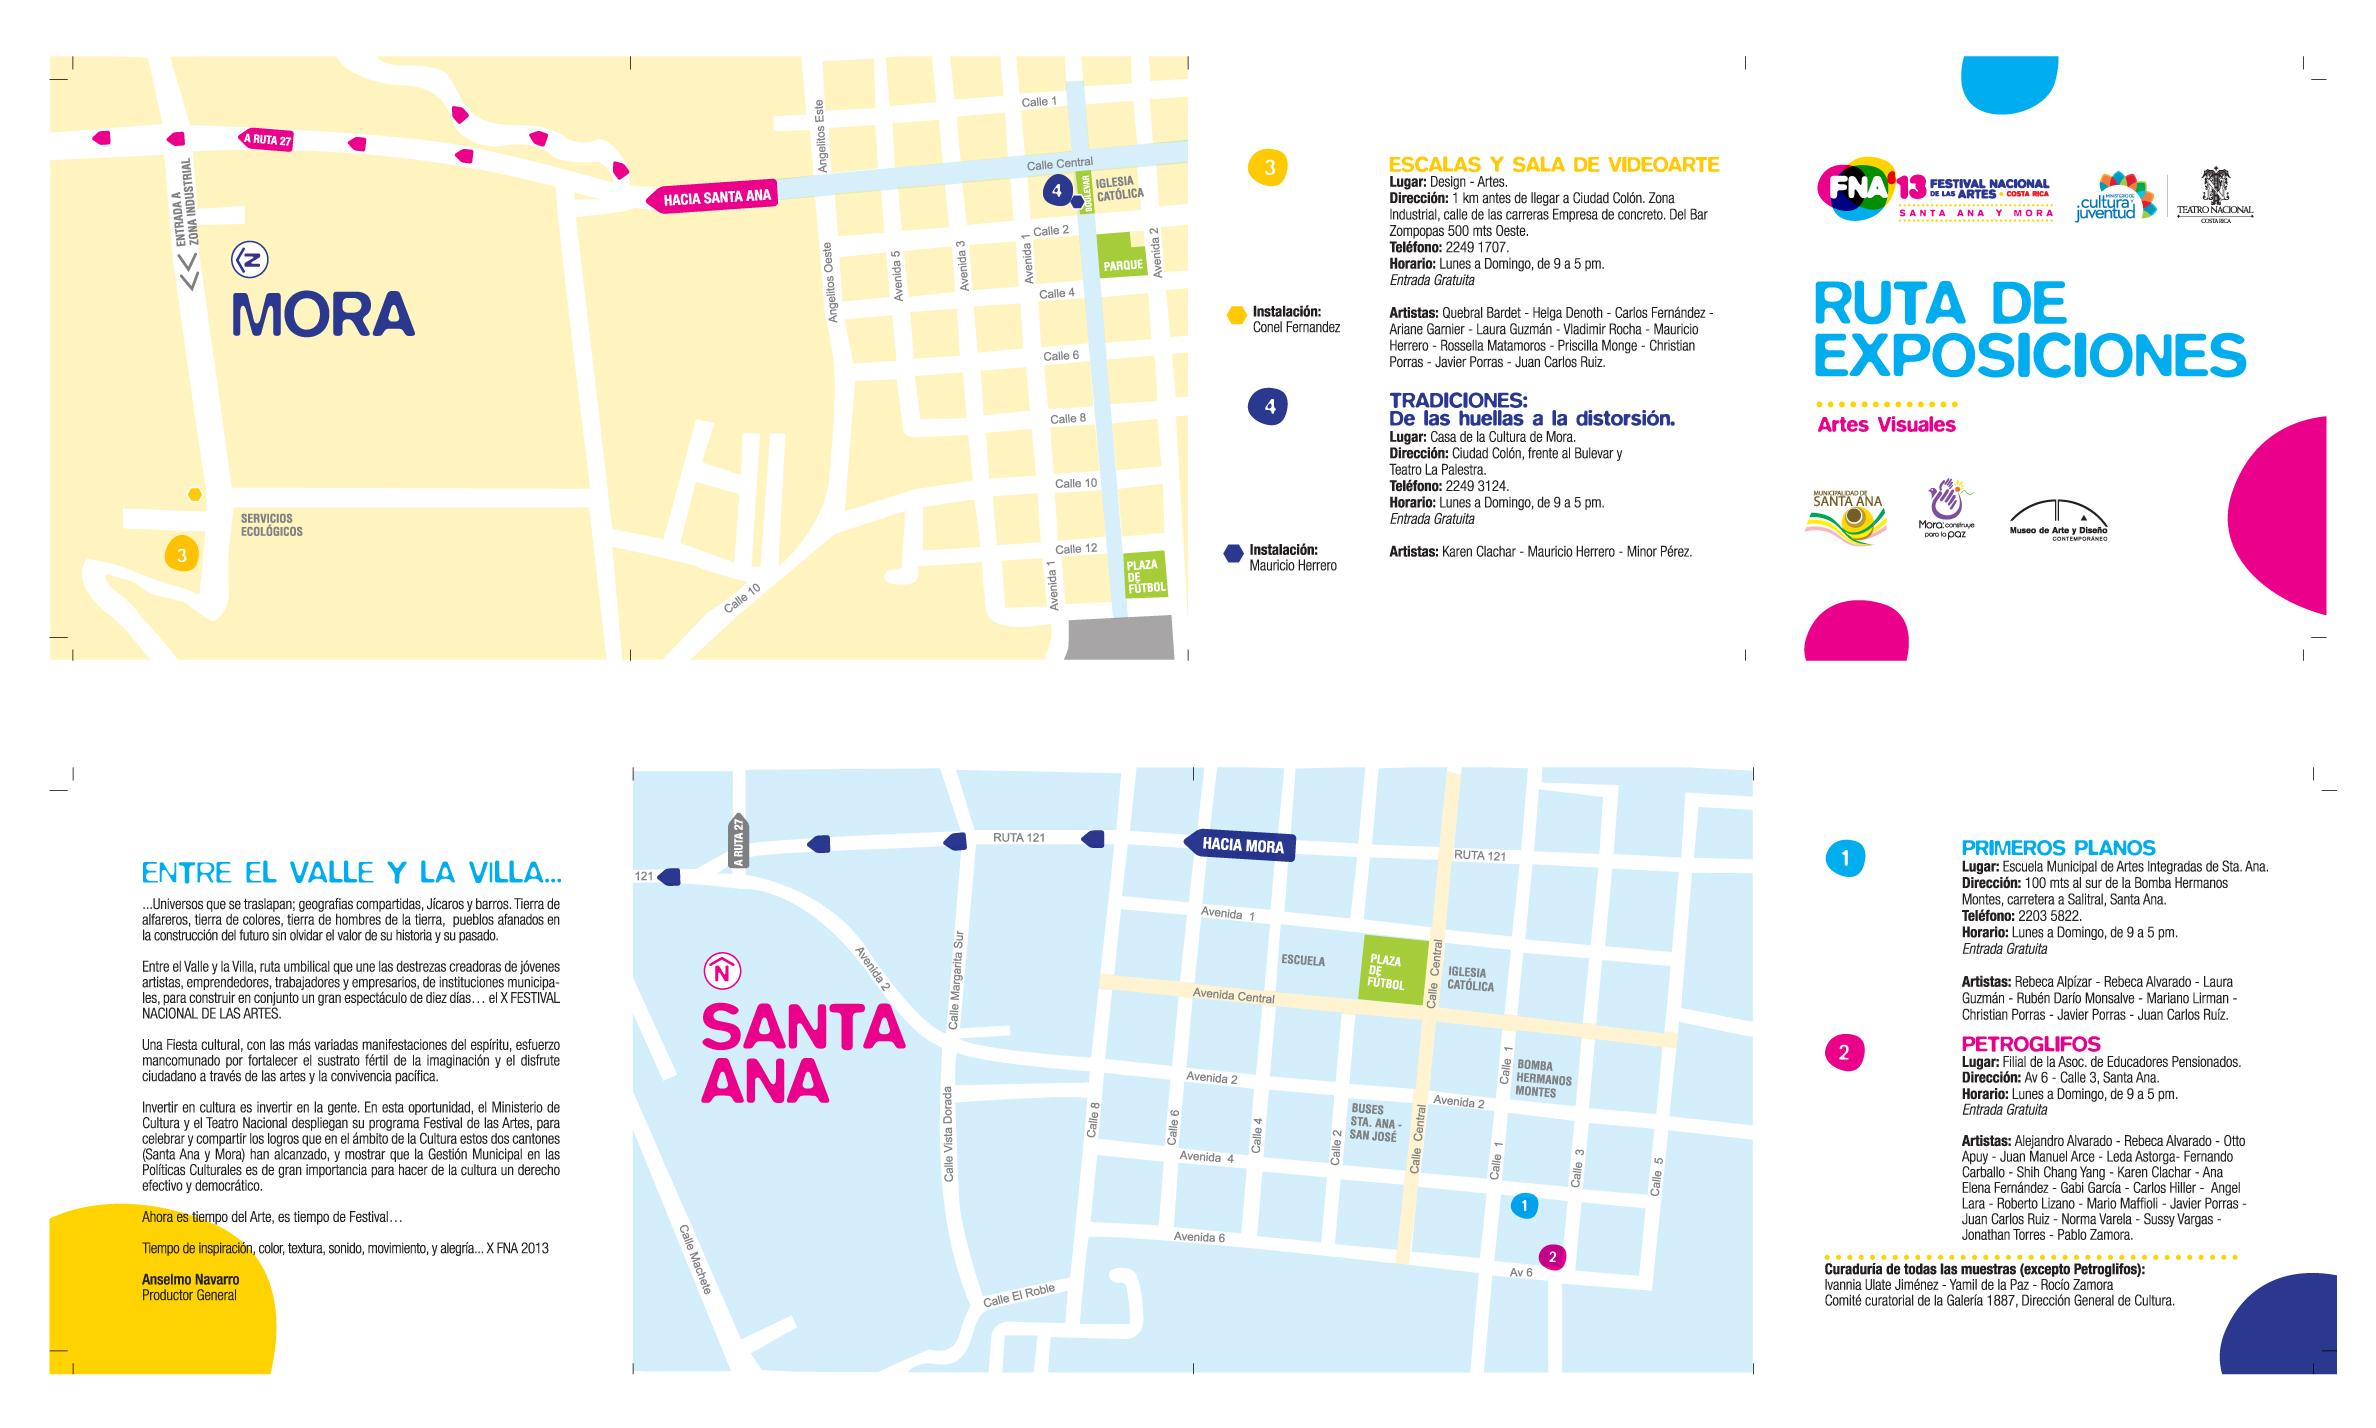 Ruta Expo Fna